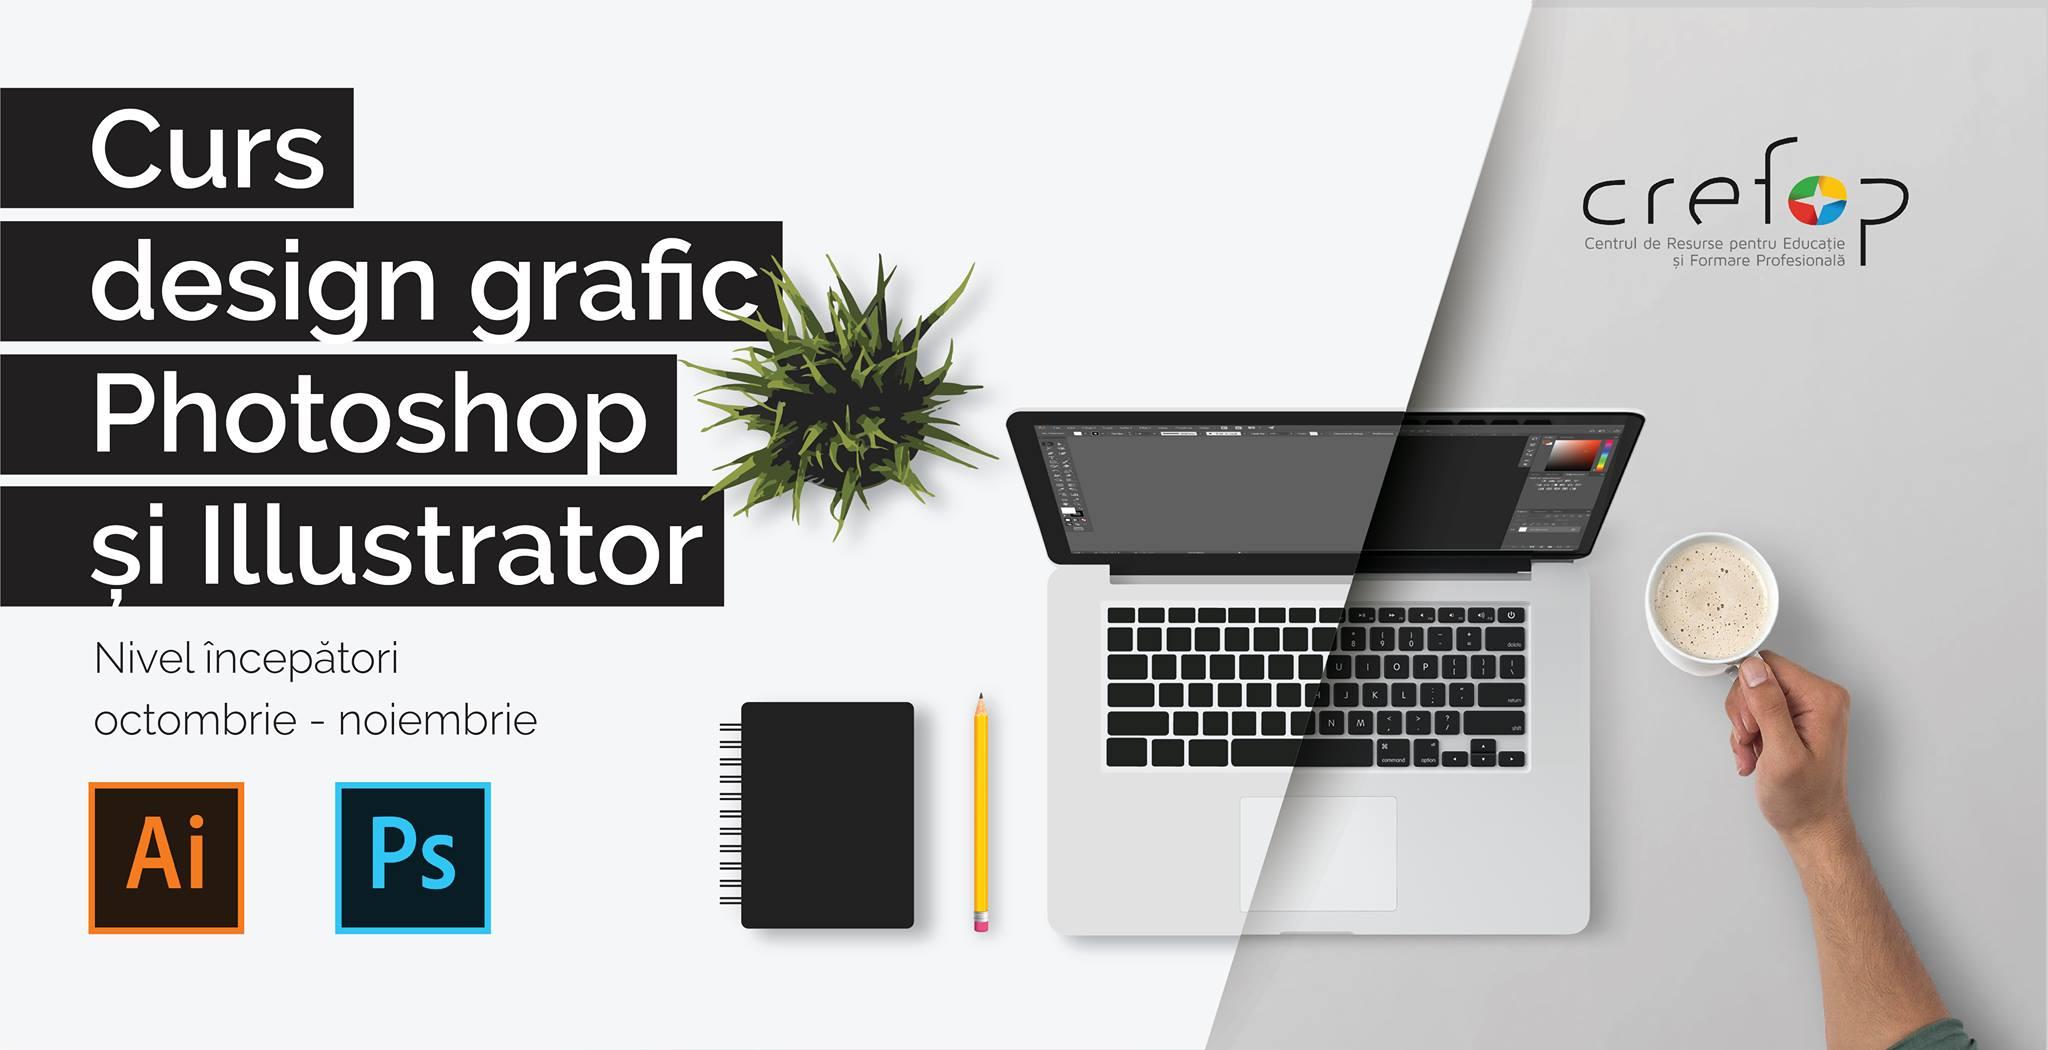 Curs Grafic Design – Photoshop&Illustrator